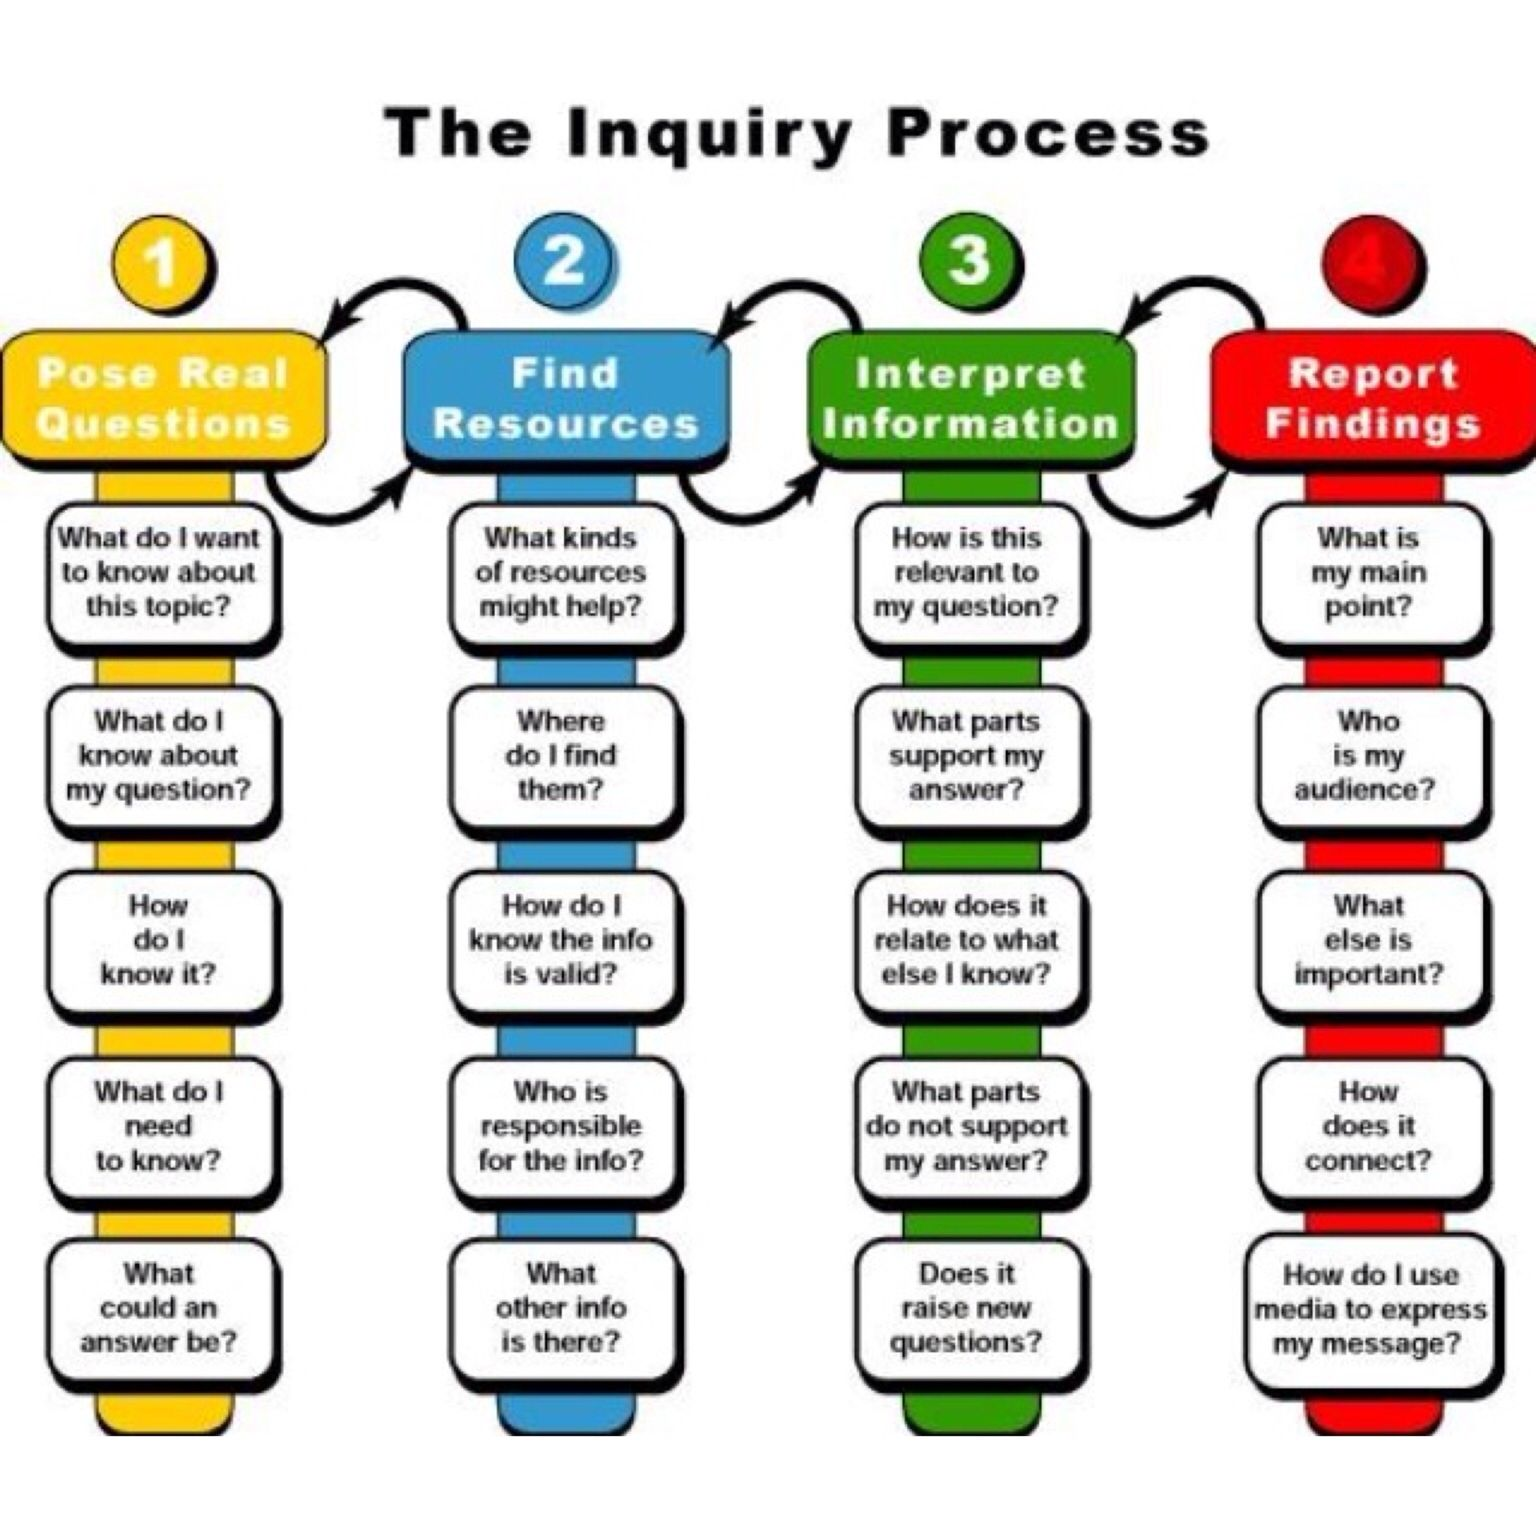 The Inquiry Process